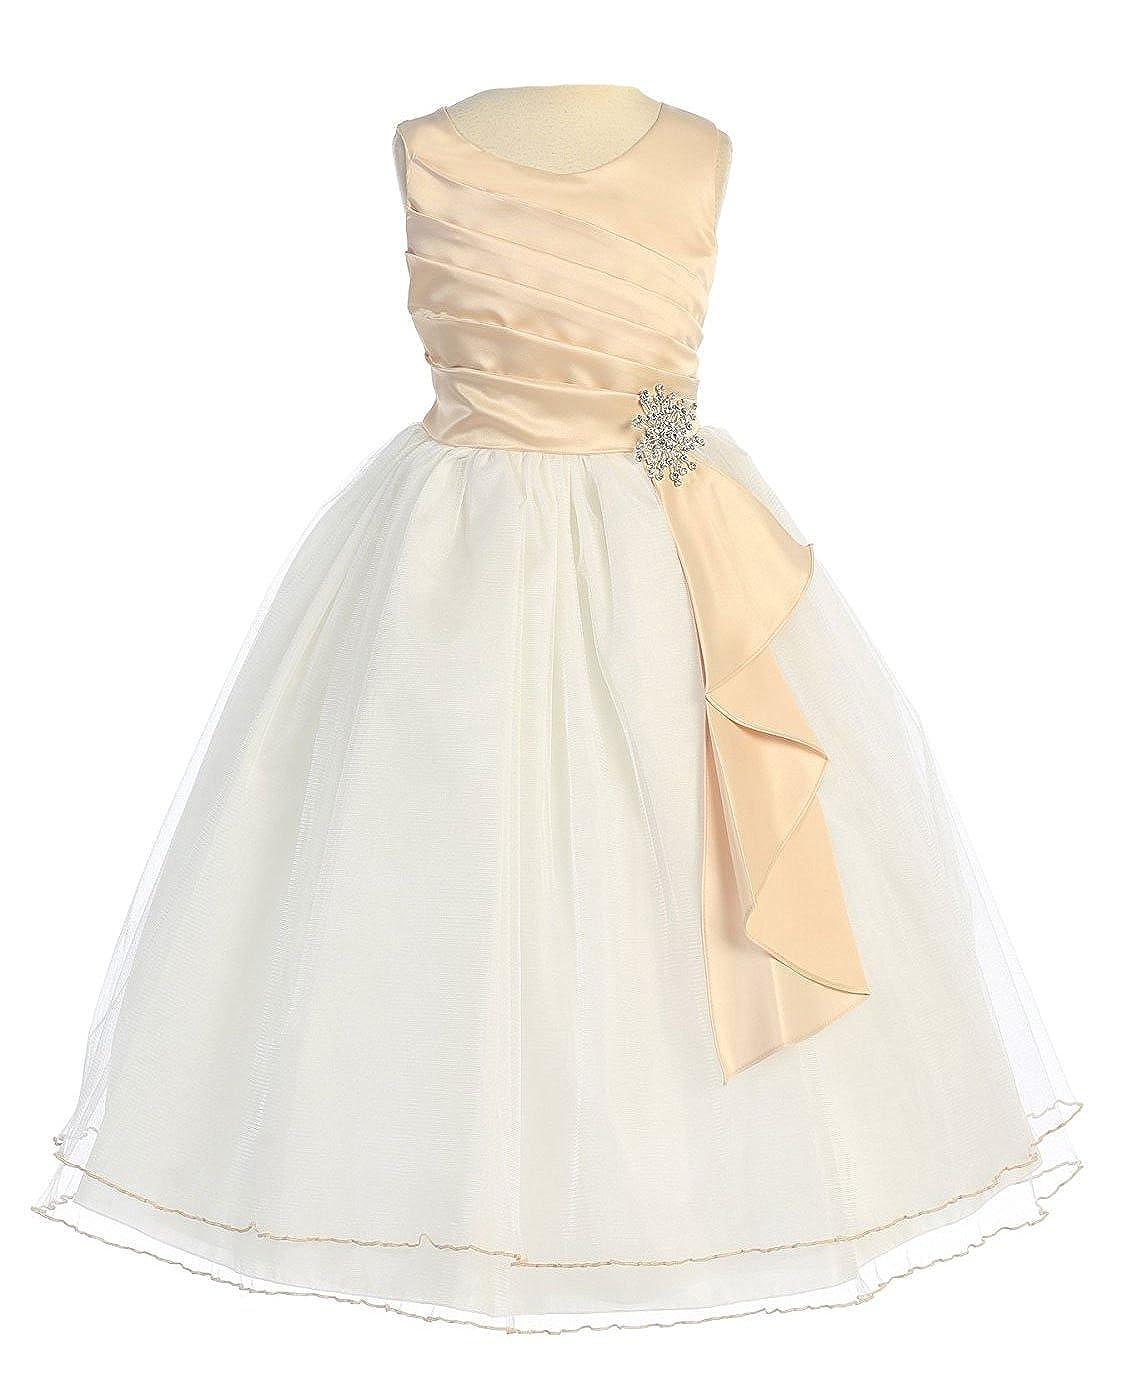 23454737bd Amazon.com  Chic Baby Girls Surplice Double Layer Girl Dress  Clothing